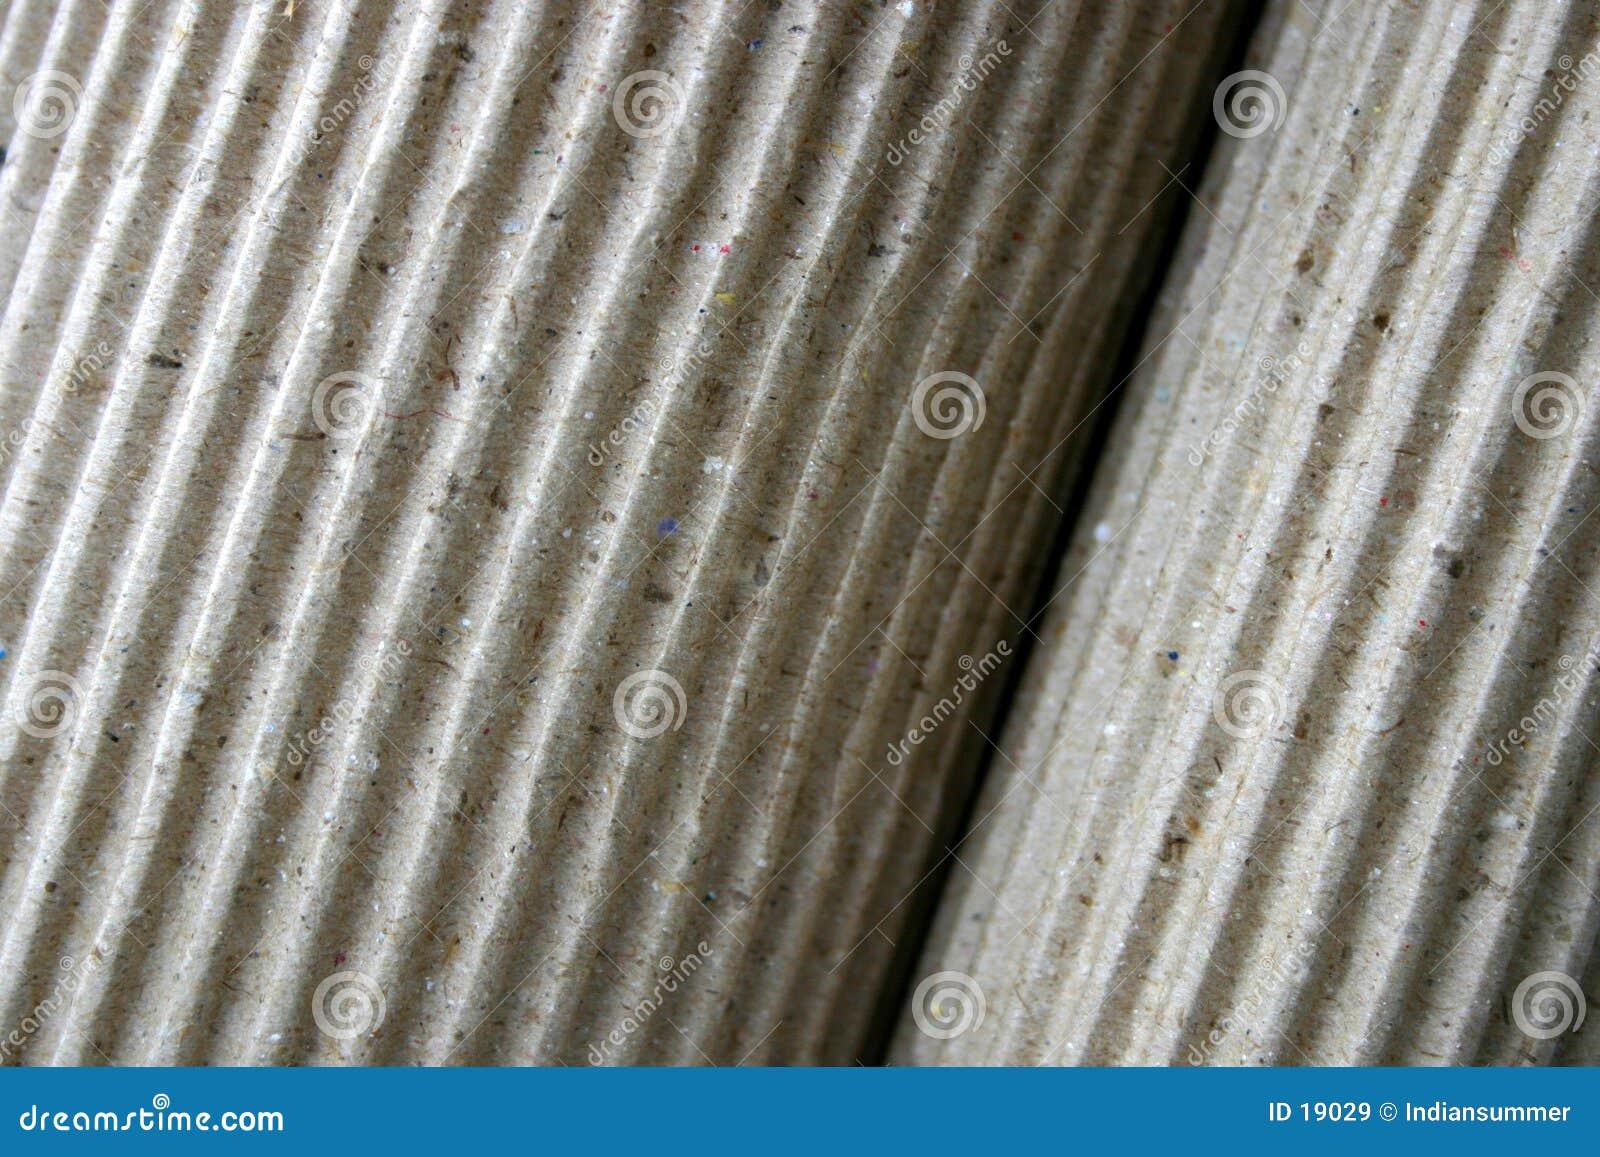 Papel ondulado, rolled-up, close-up